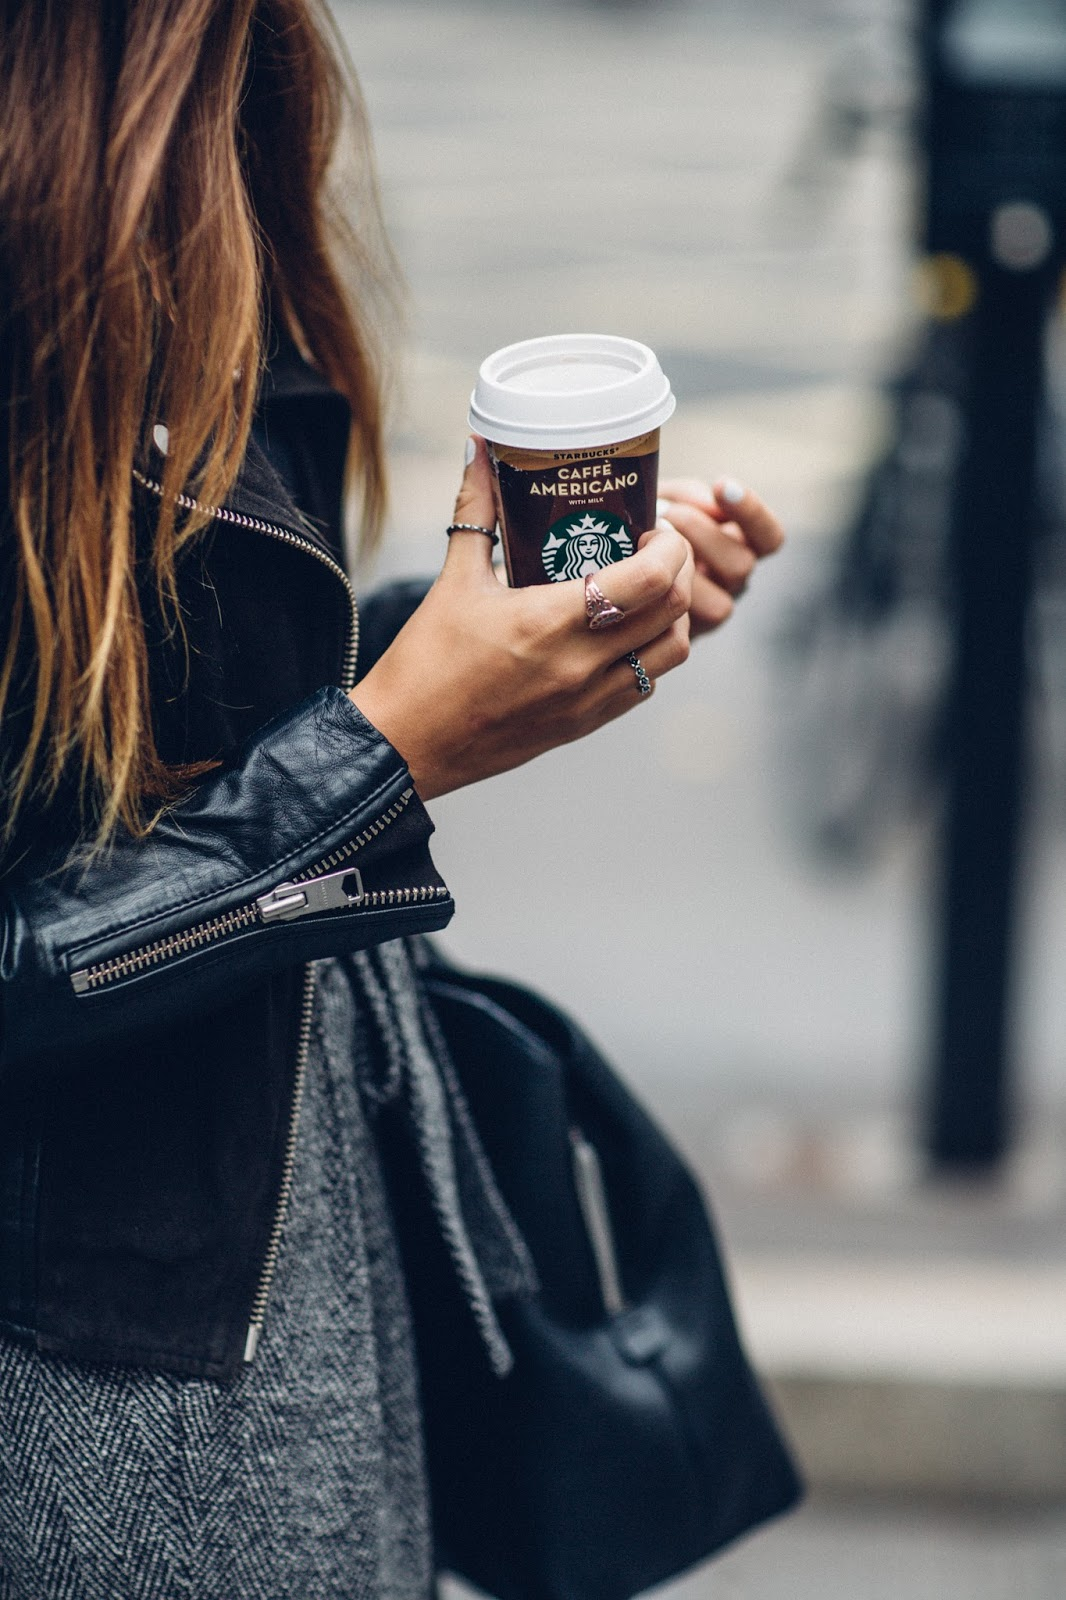 starbucks caffe americano review